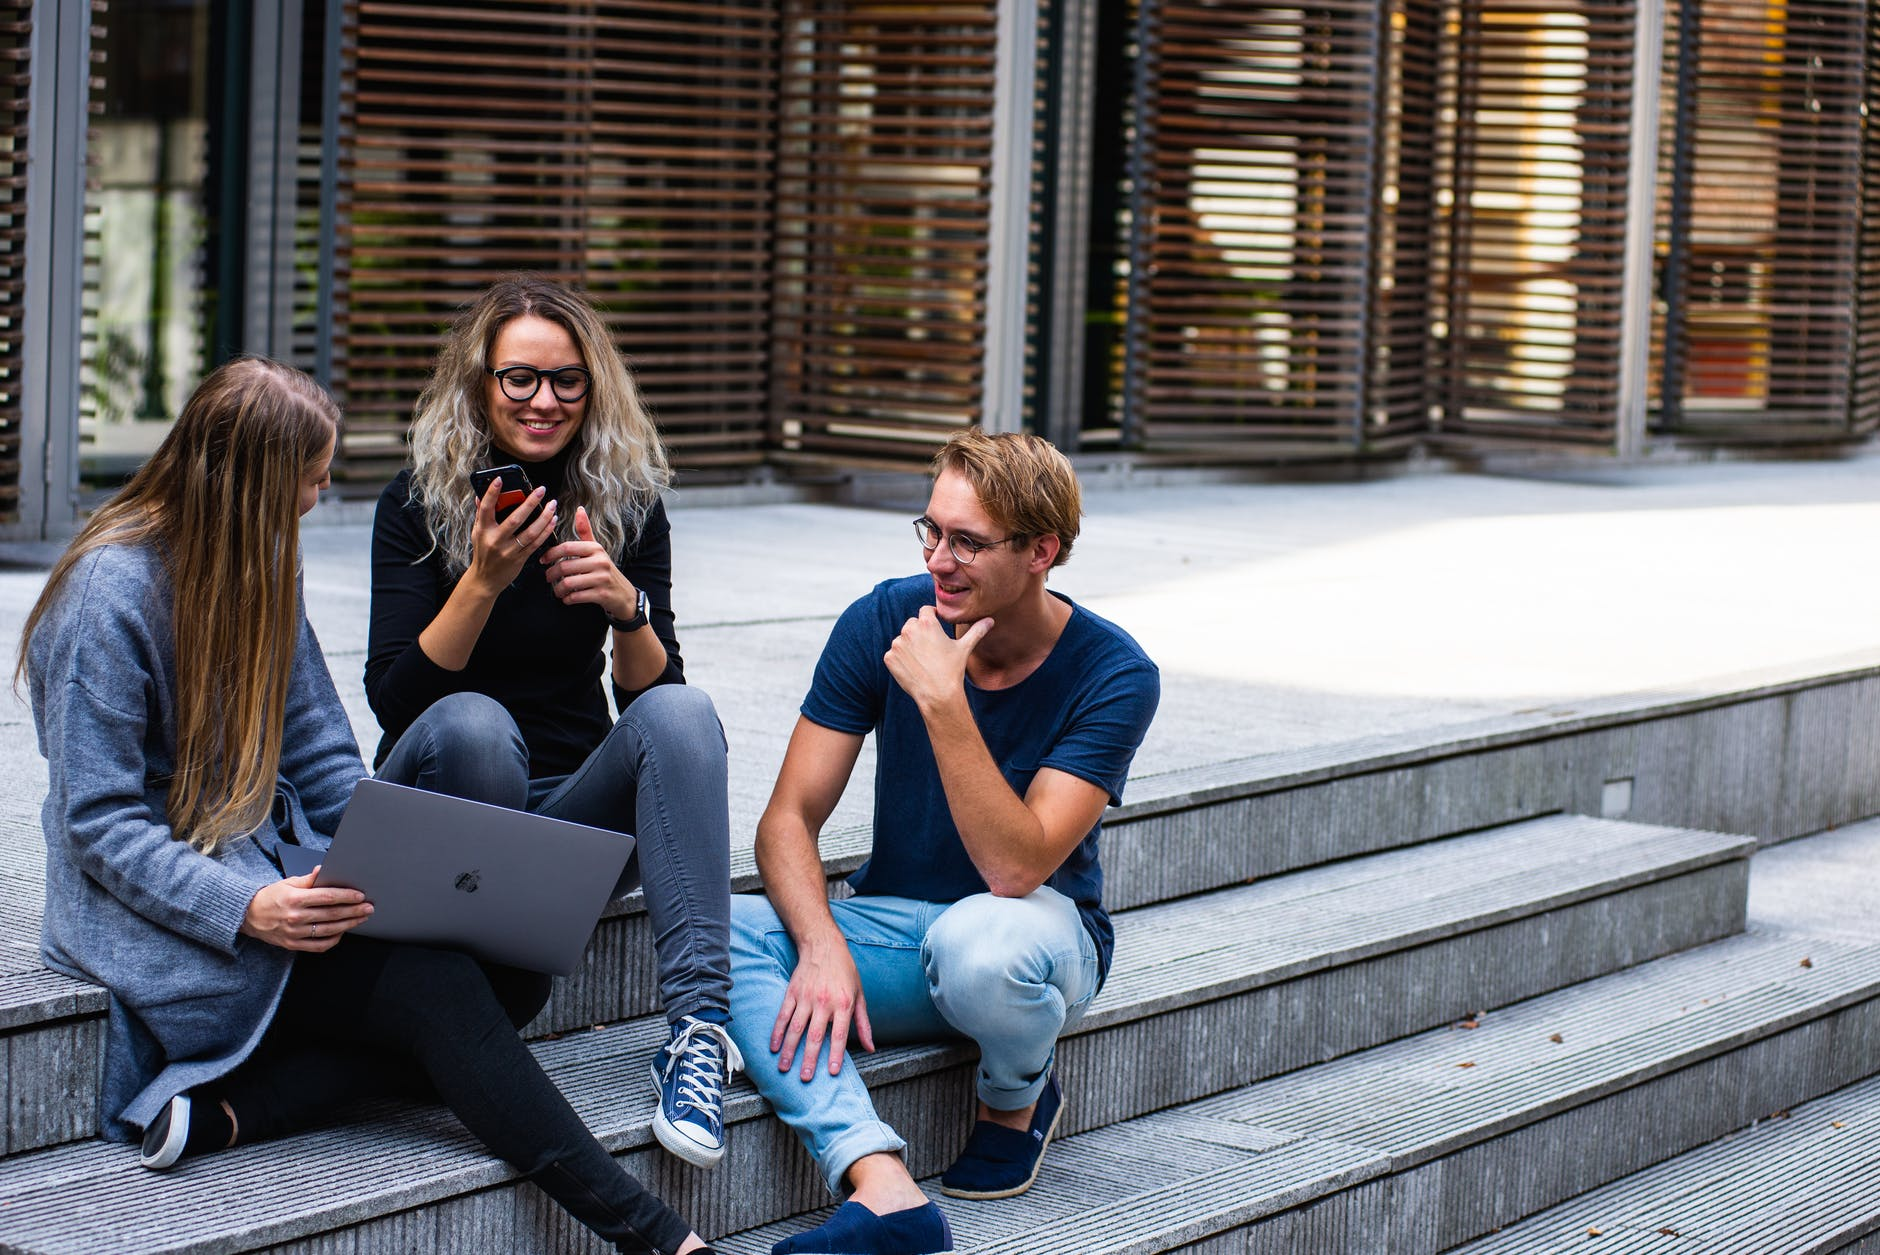 4 Best US Scholarship Programs for International Students